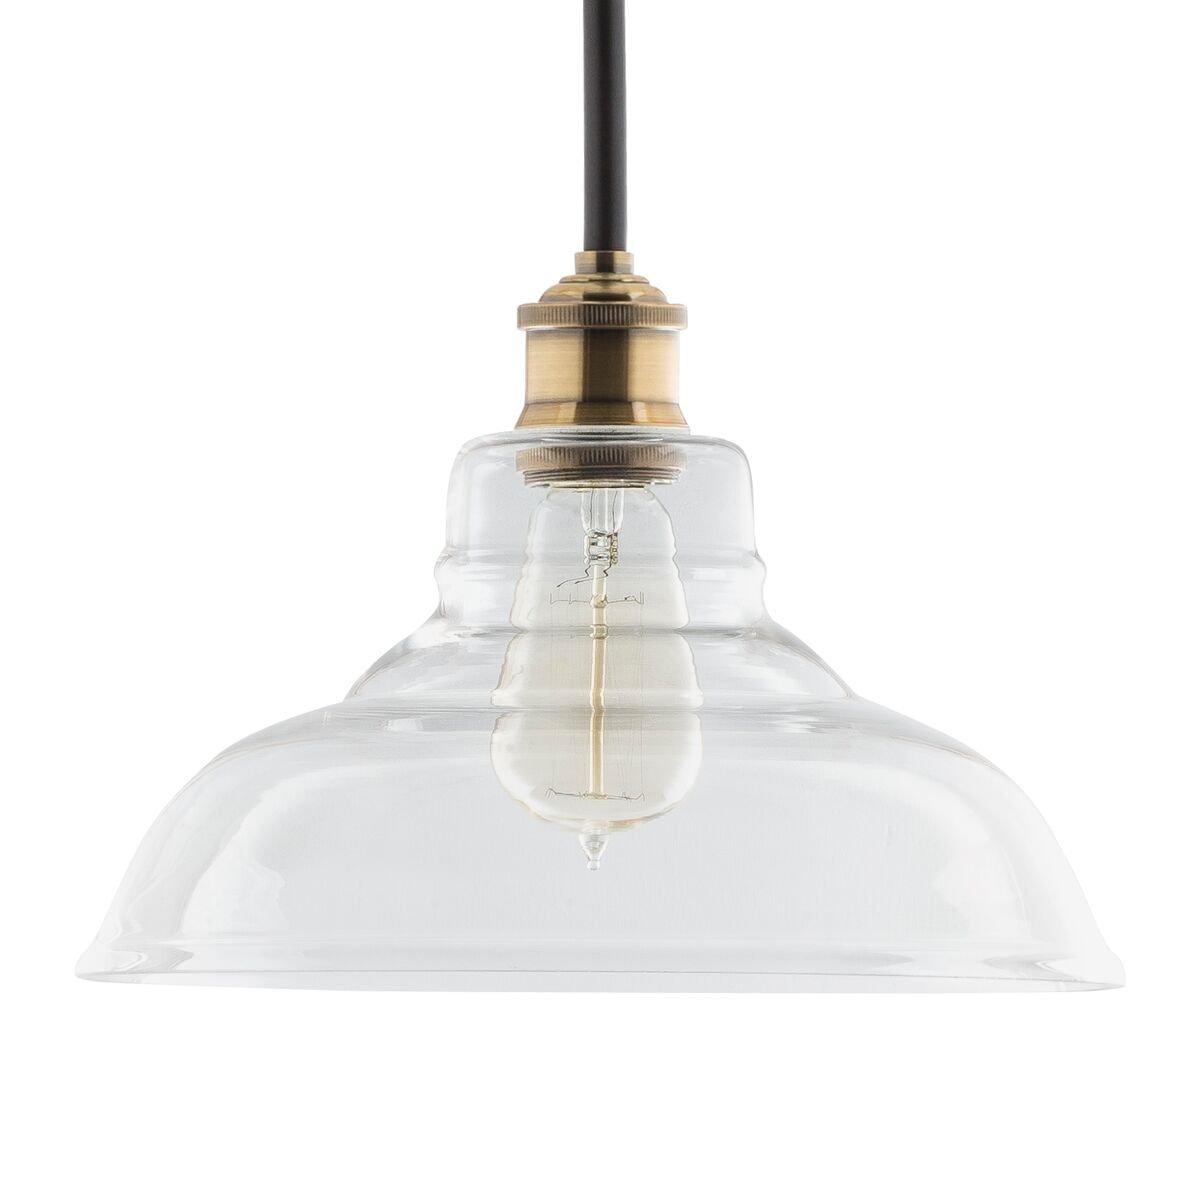 Lucera Contemporary Kitchen Pendant Light - Antique Brass Hanging Fixture - Linea di Liara LL-P431-AB